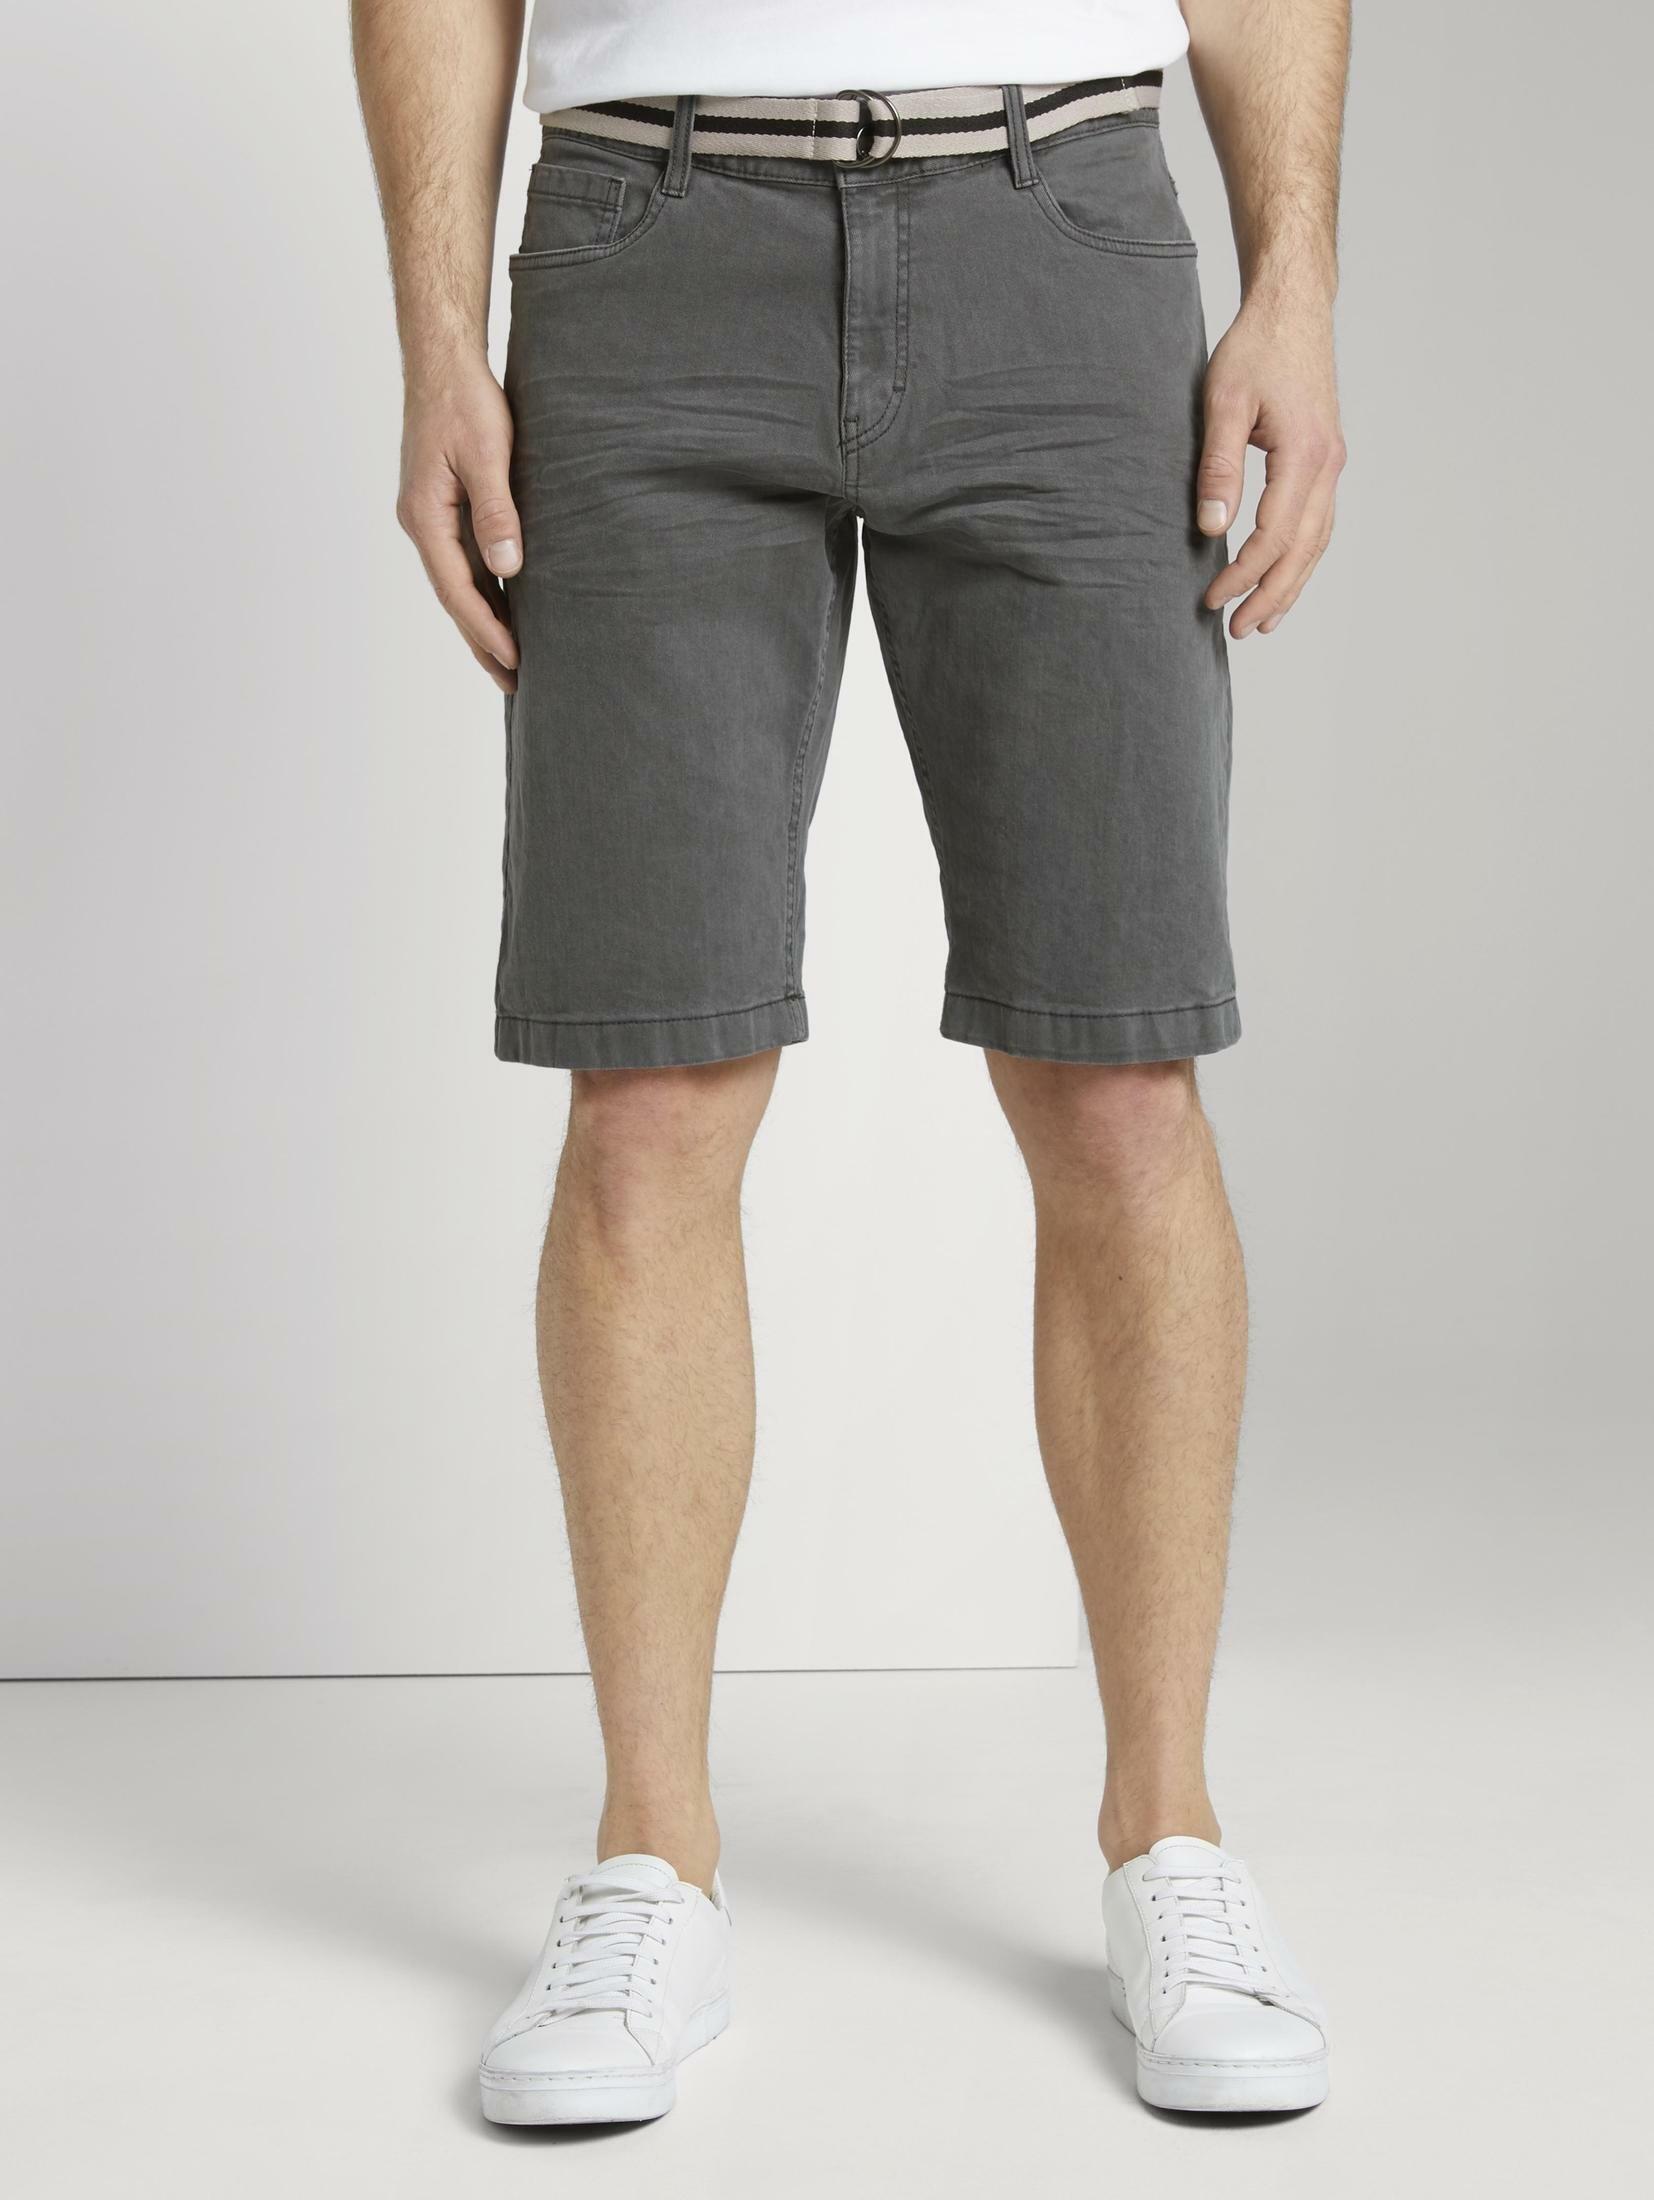 Tom Tailor 5-pocketsjeans »Josh Regular Slim Jeans-Shorts mit Gürtel« goedkoop op otto.nl kopen